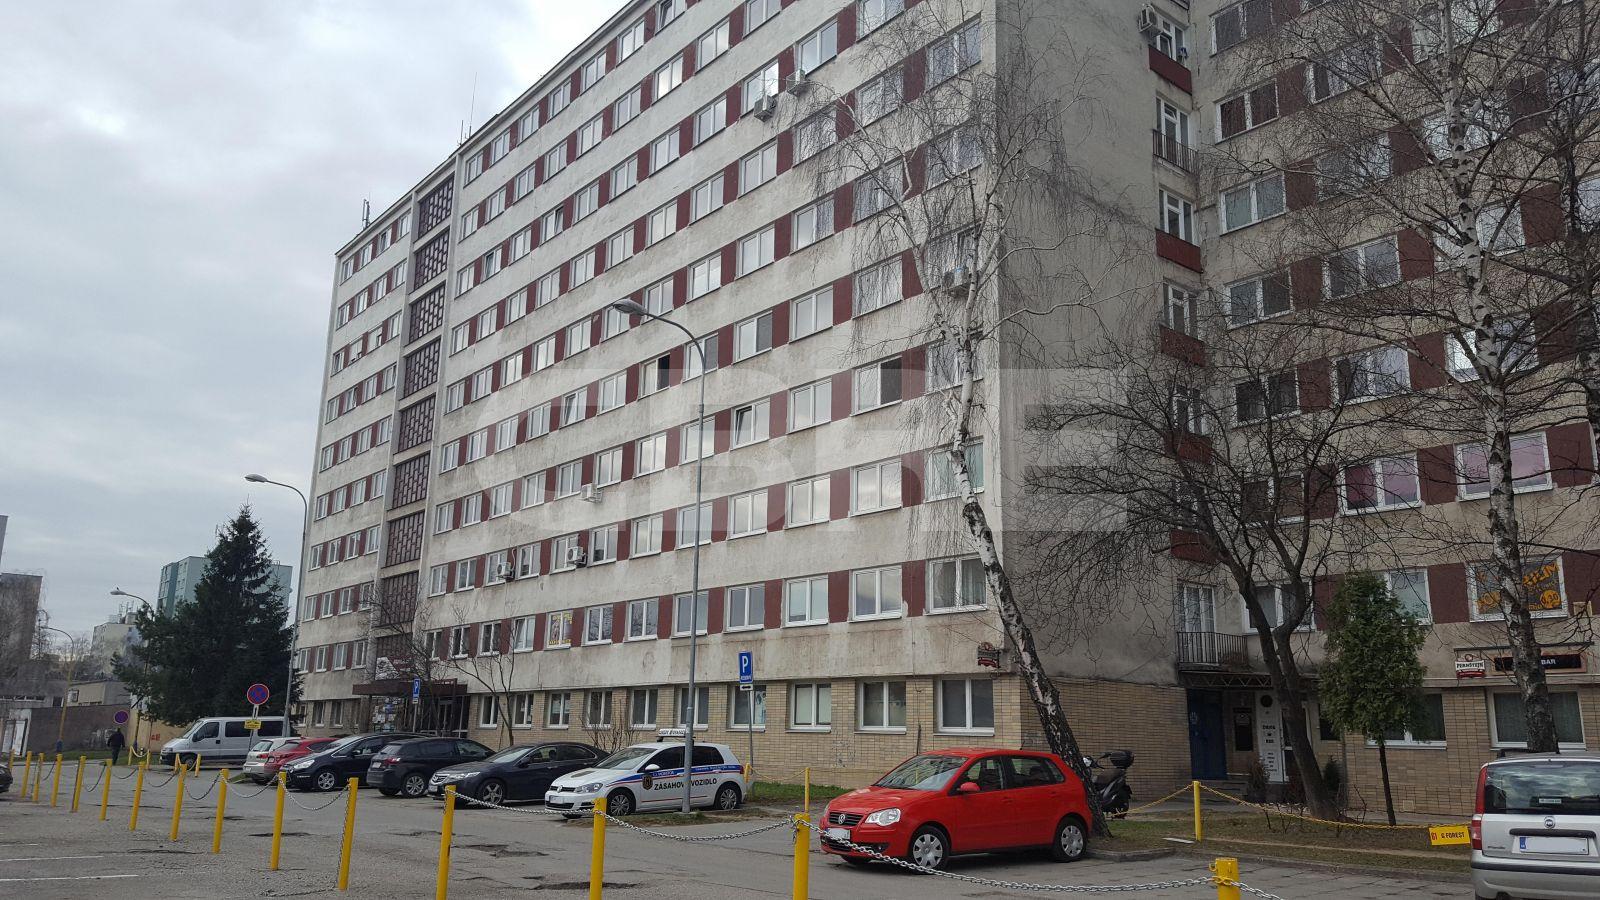 Podnikateľské centrum - Pražská 4, Košice, Košice - Staré Mesto | Offices for rent by CBRE | 1